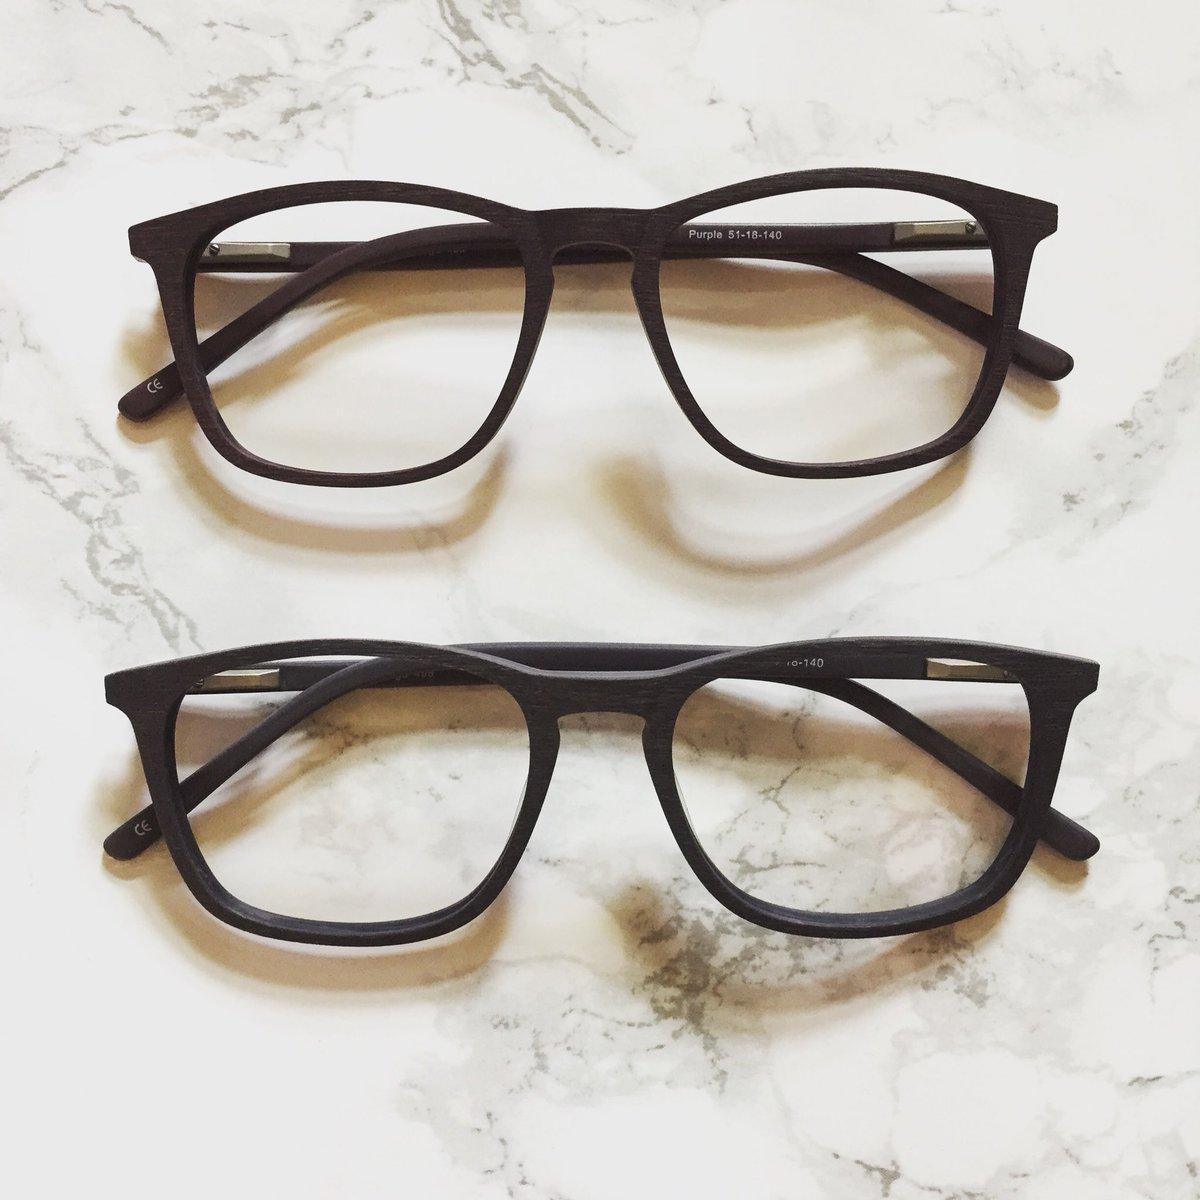 0aab5728a7bf Order yours at http   www.mirage-eyewear.co.uk  mirage  mirageeyewear   glasses  specs  frames  opticians  optometry  optometrist  optom   optometrystudent ...